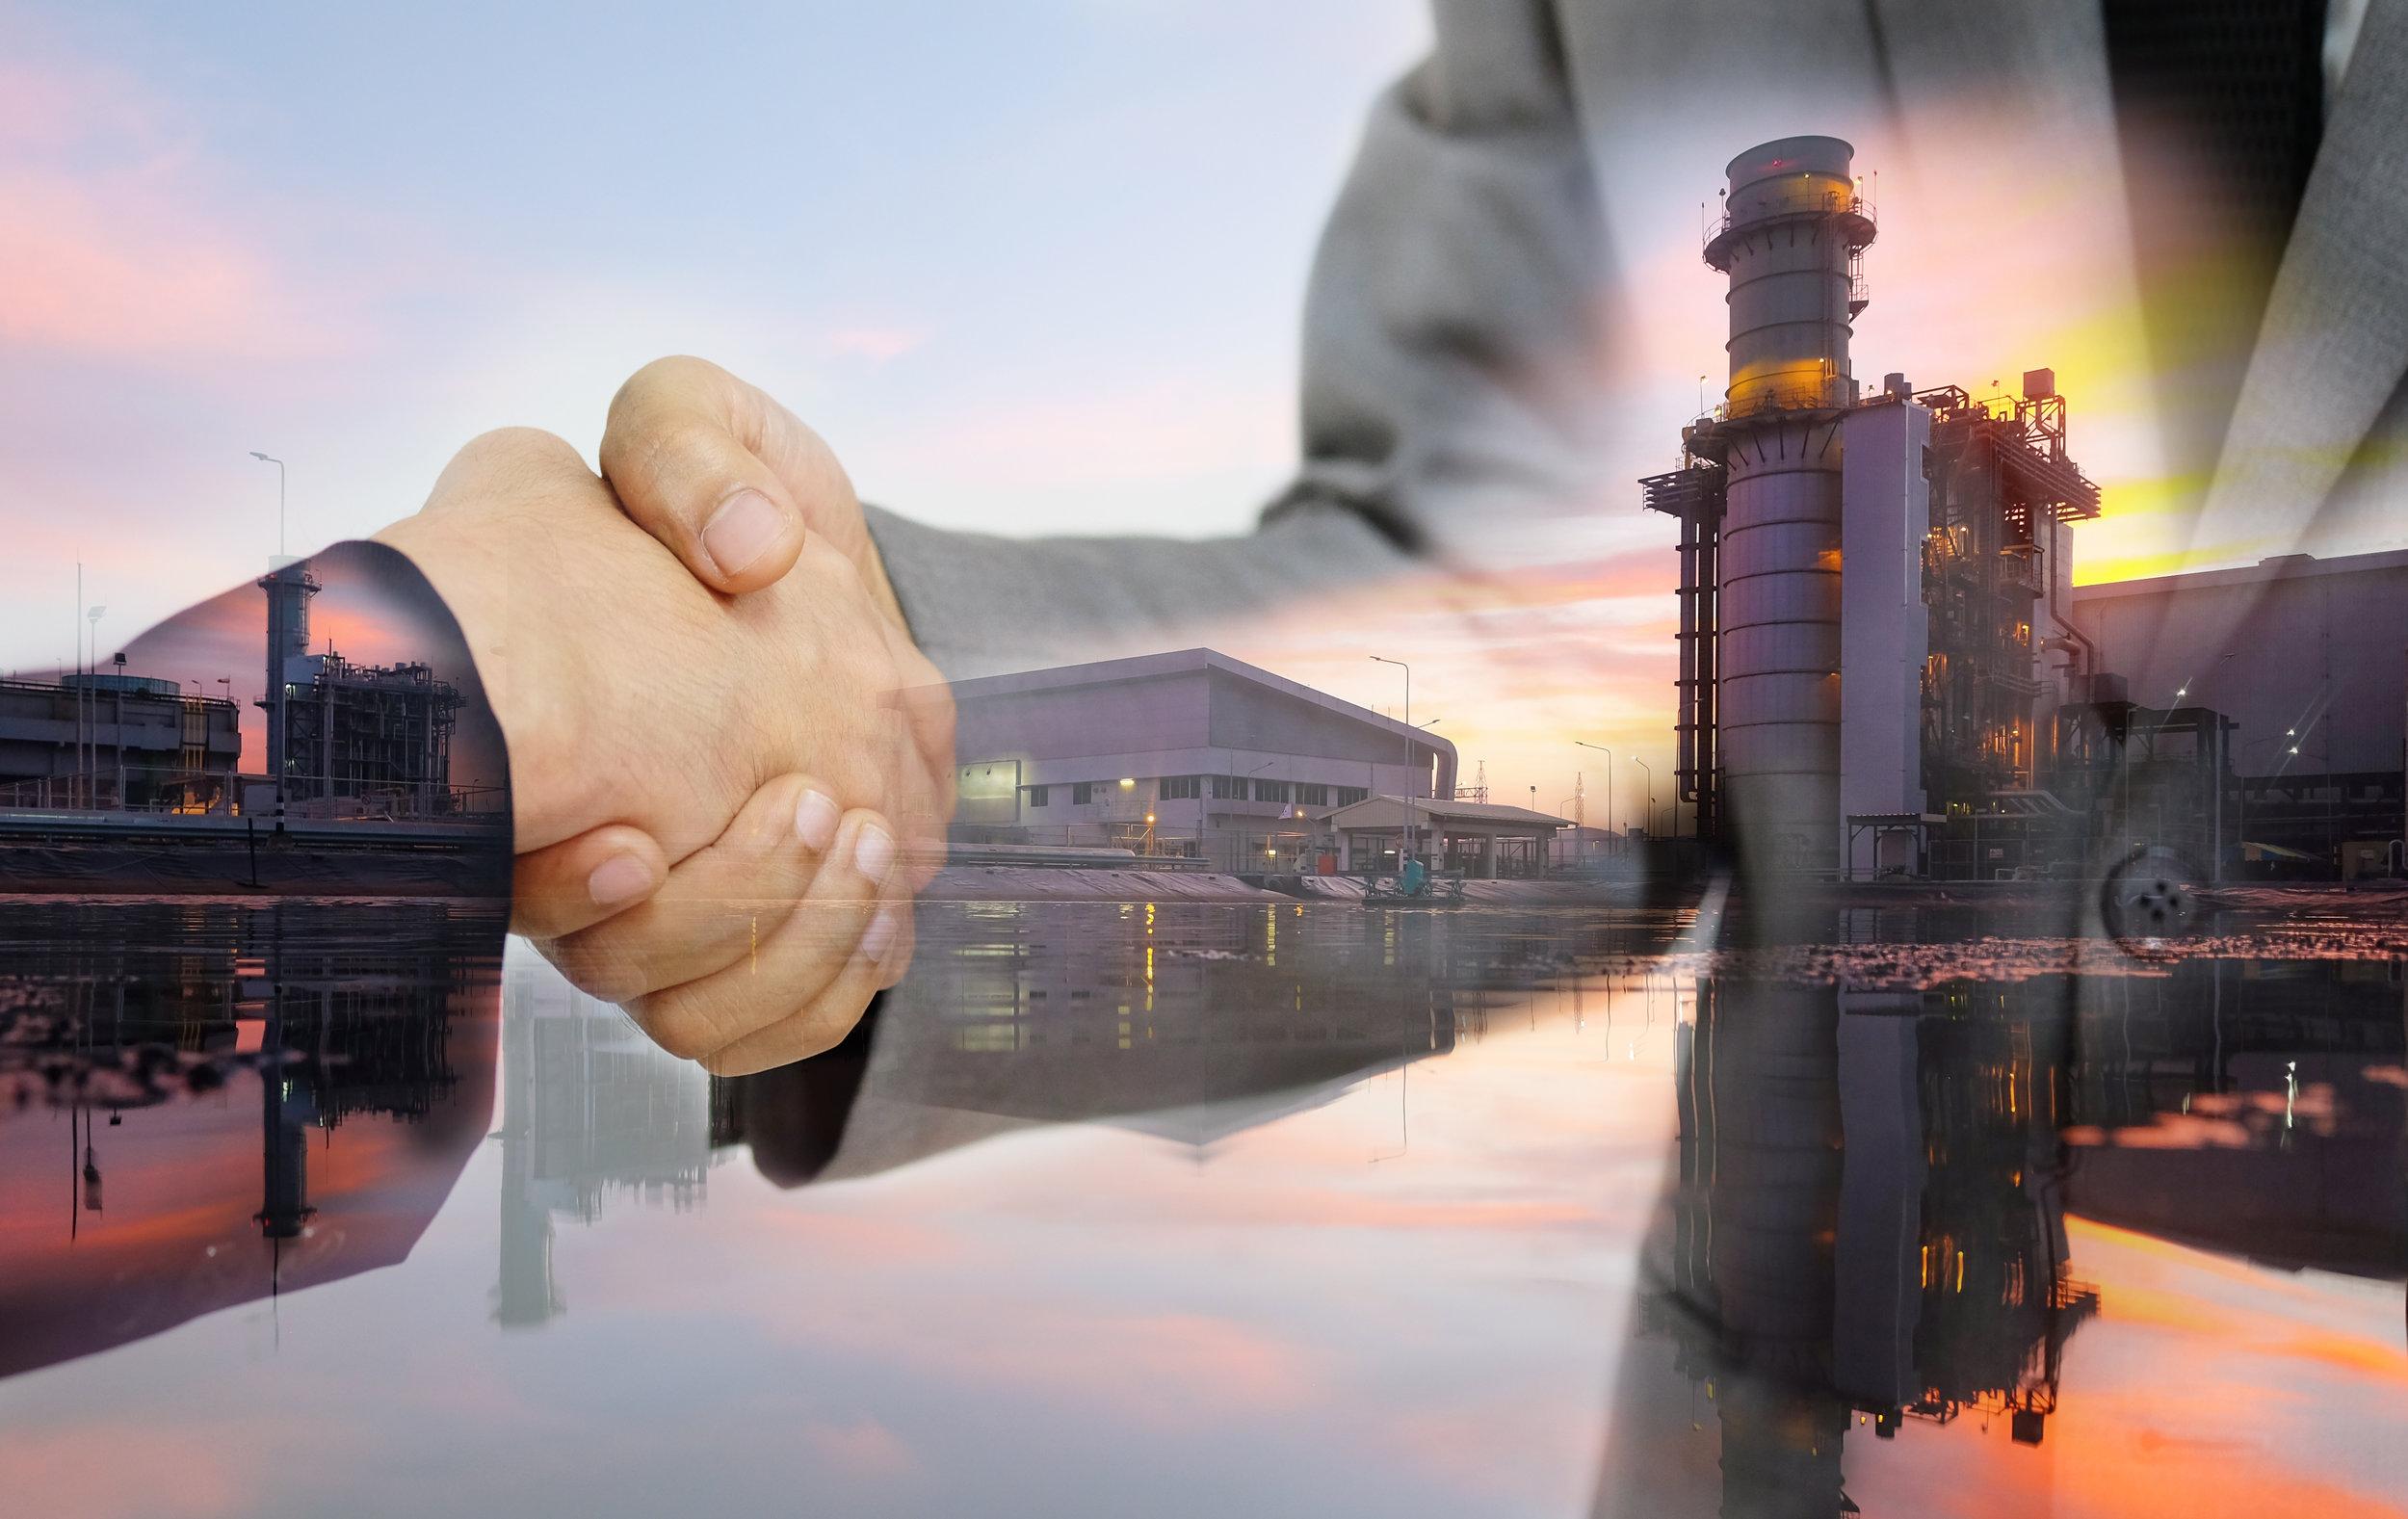 business handshake manufacture industry iStock-639951582.jpg